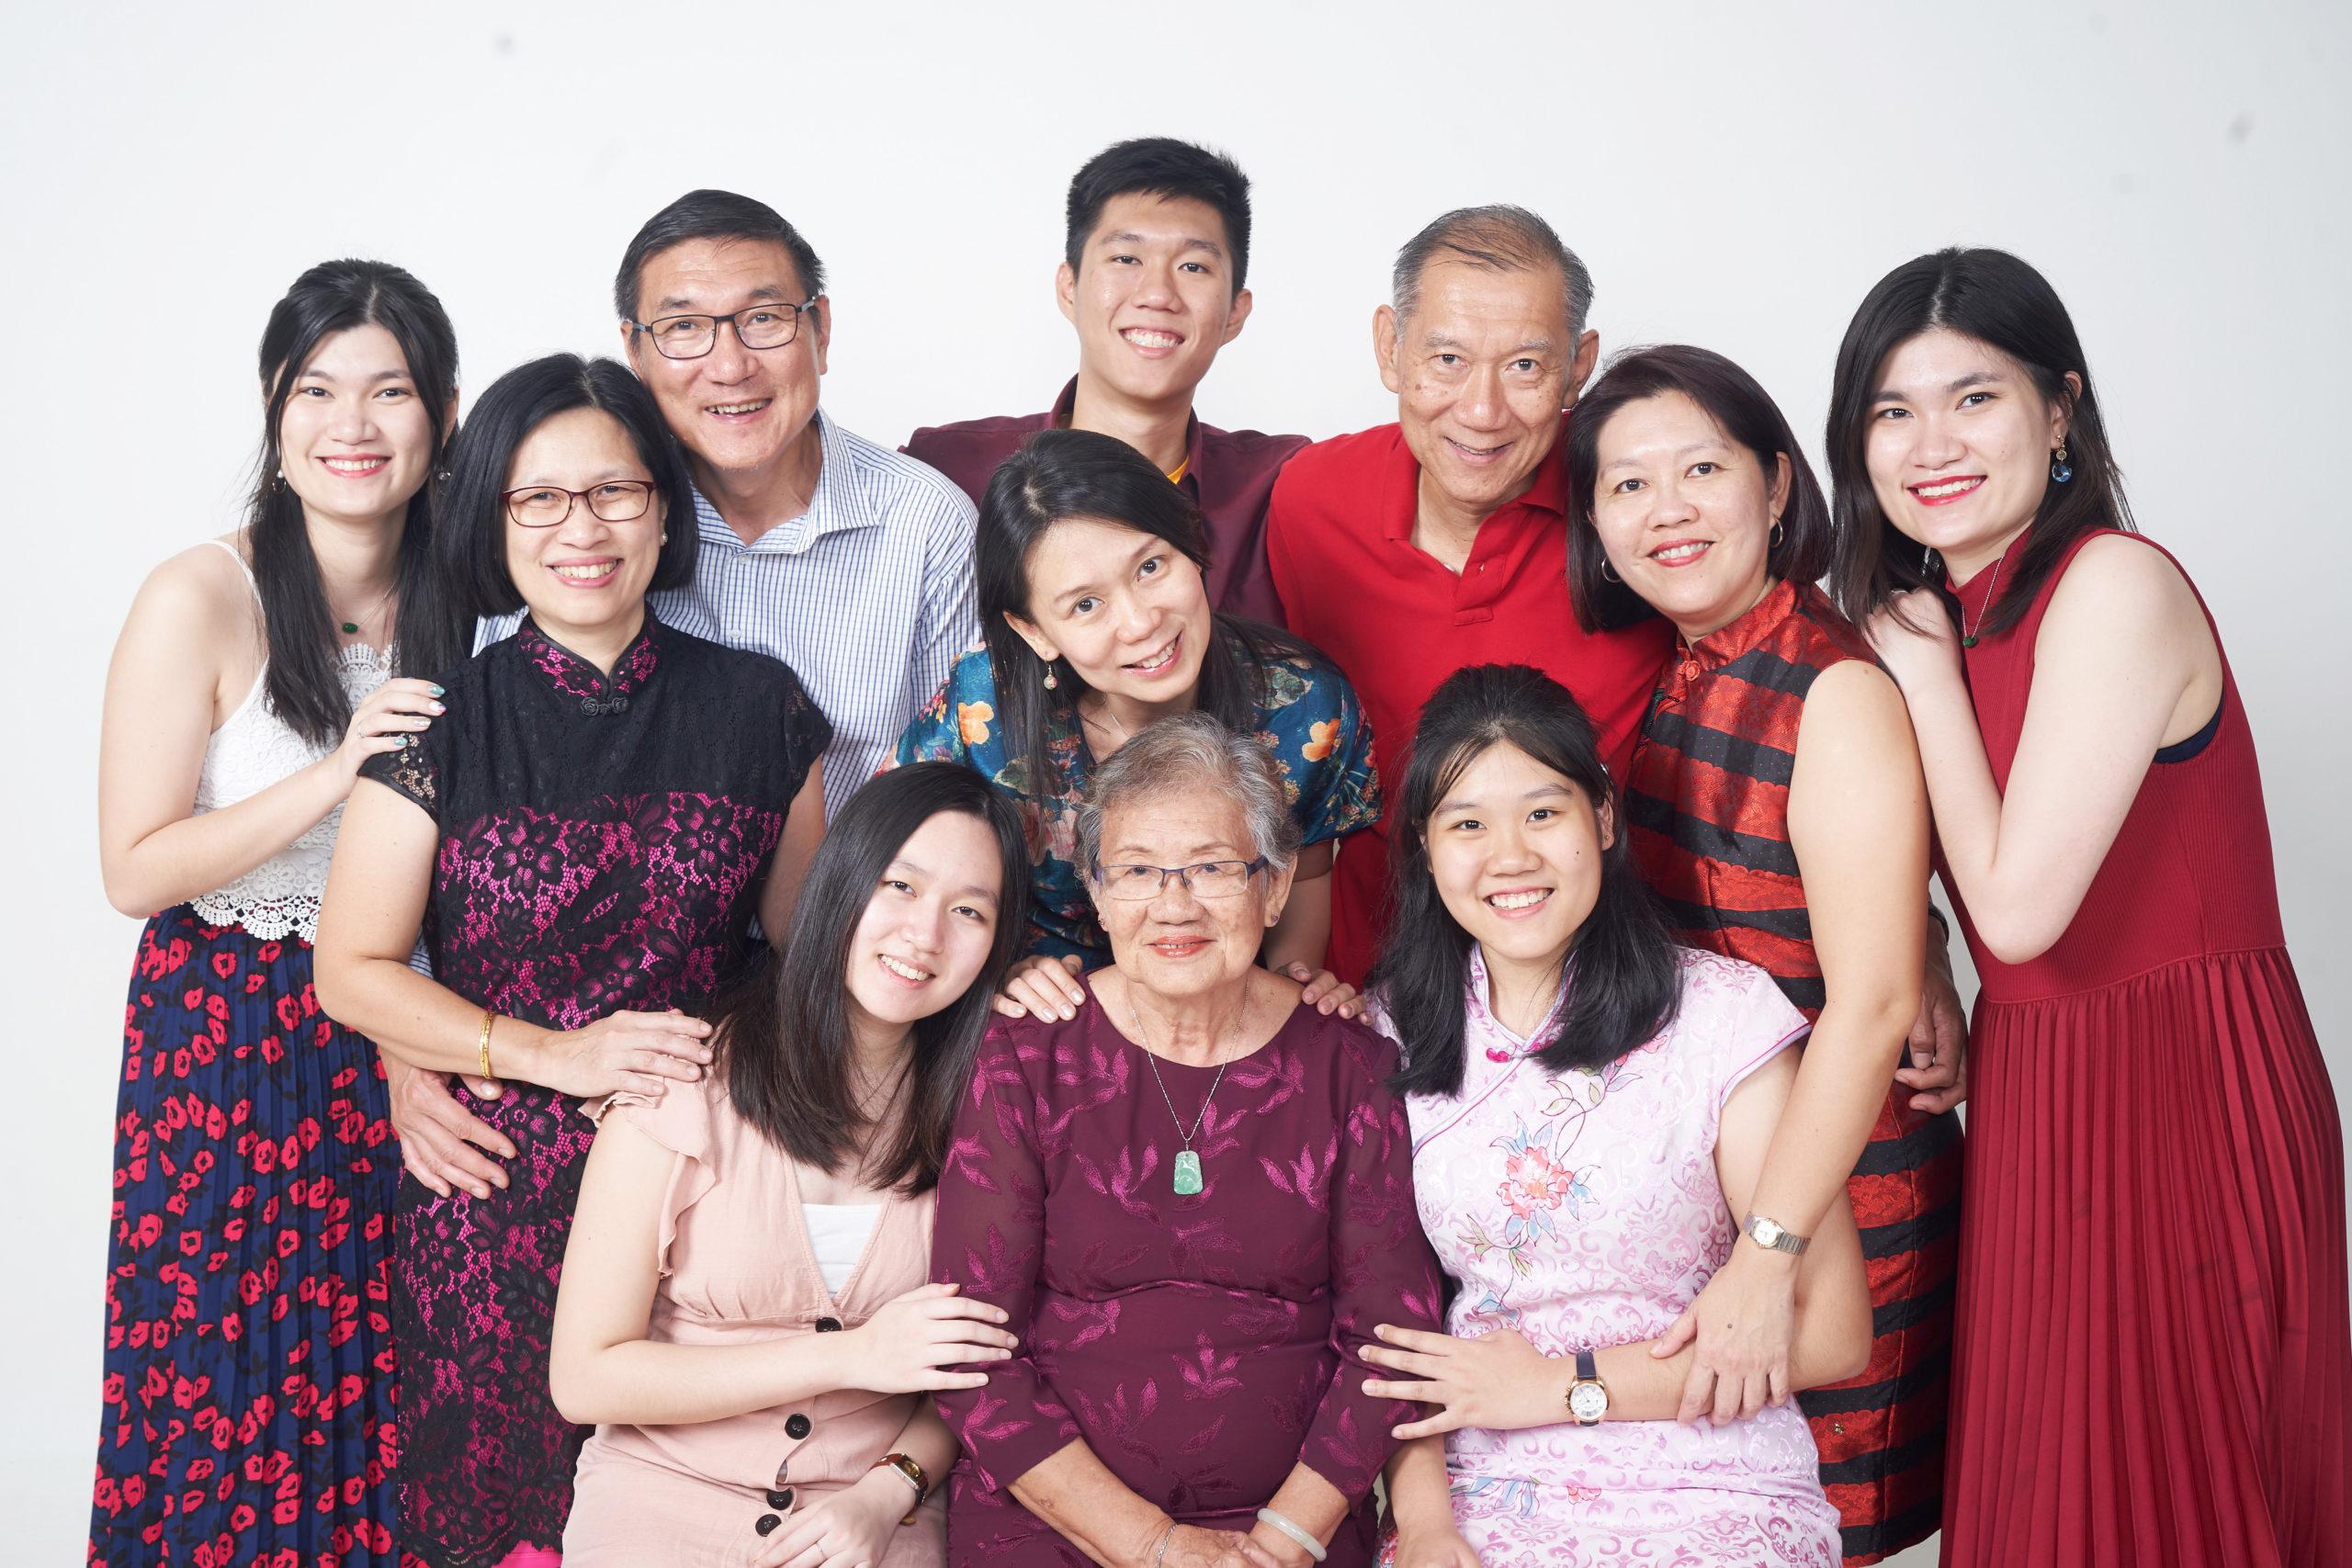 studio-gambar-keluarga-family-potret-portrait-photography-white-large-big-frame-print-poster-beautiful-profile-photoshoot-ad-studio-shah-alam-petaling-subang-klang-sunway-bukit-jelutong